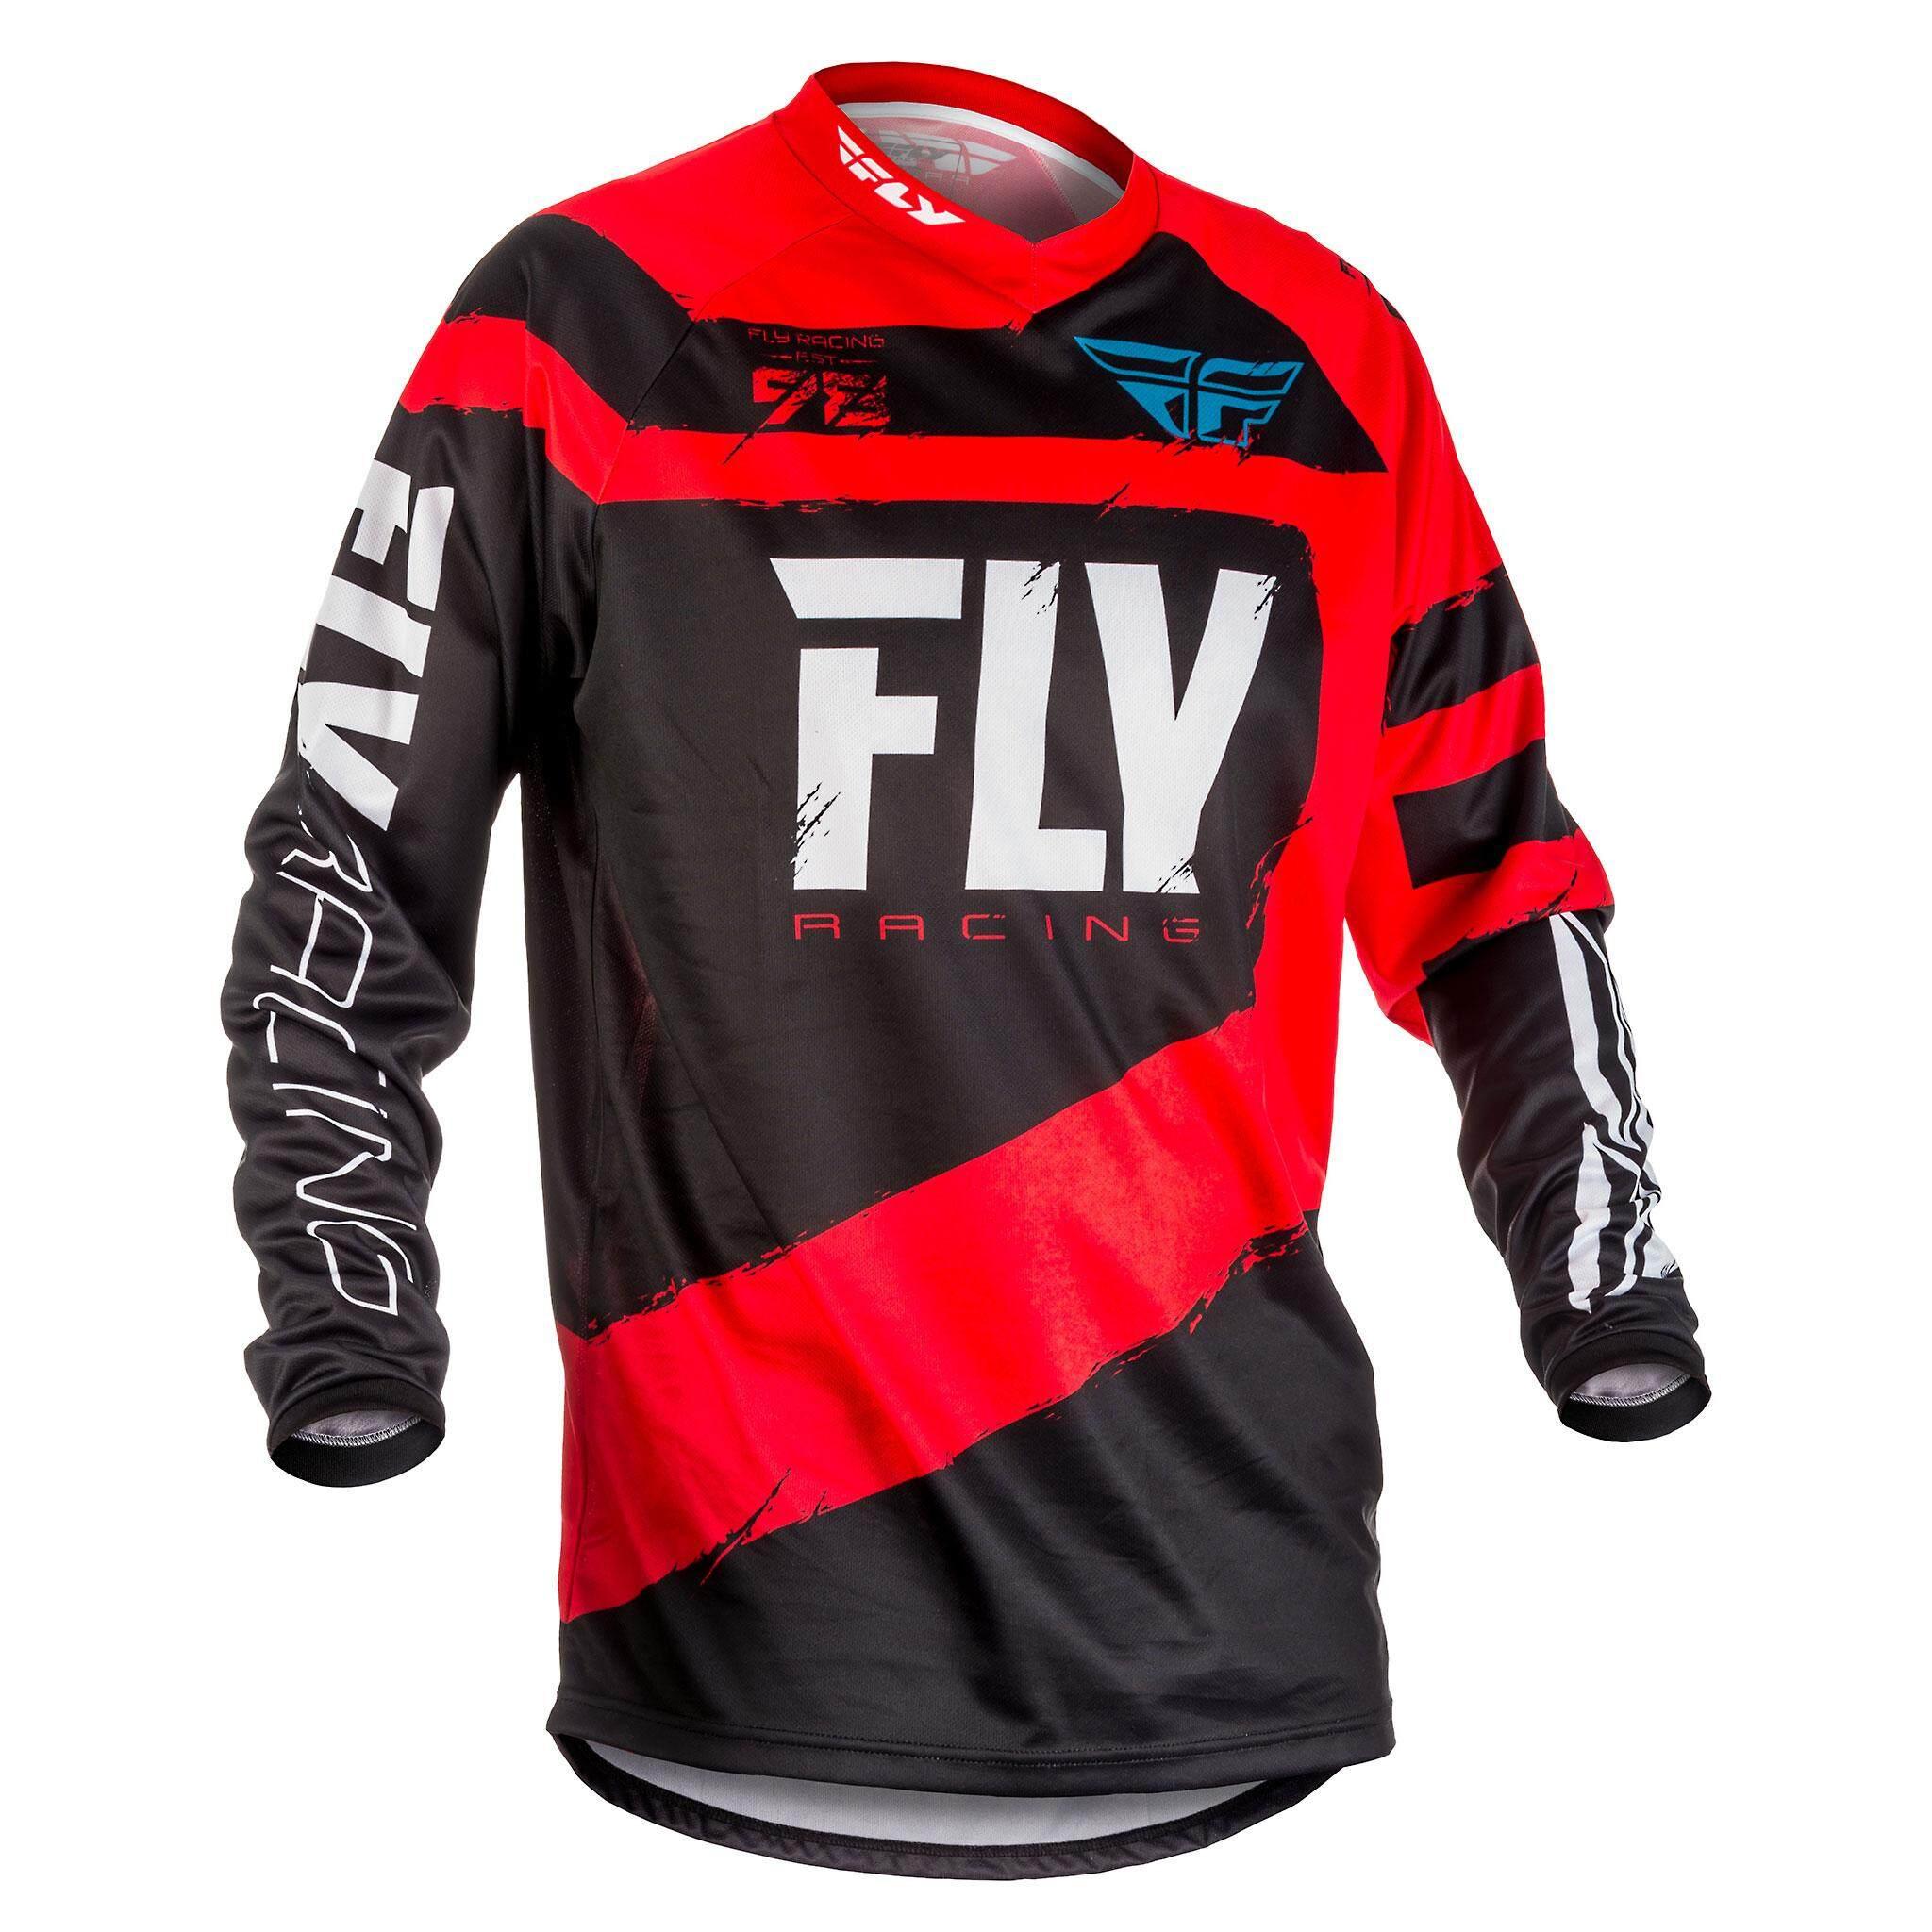 Men s Long Sleeve Racing Jersey Motocross Motorcycle Racing Shirt Dirt Bike  BMX MTB DH Racewear 9aed3da10